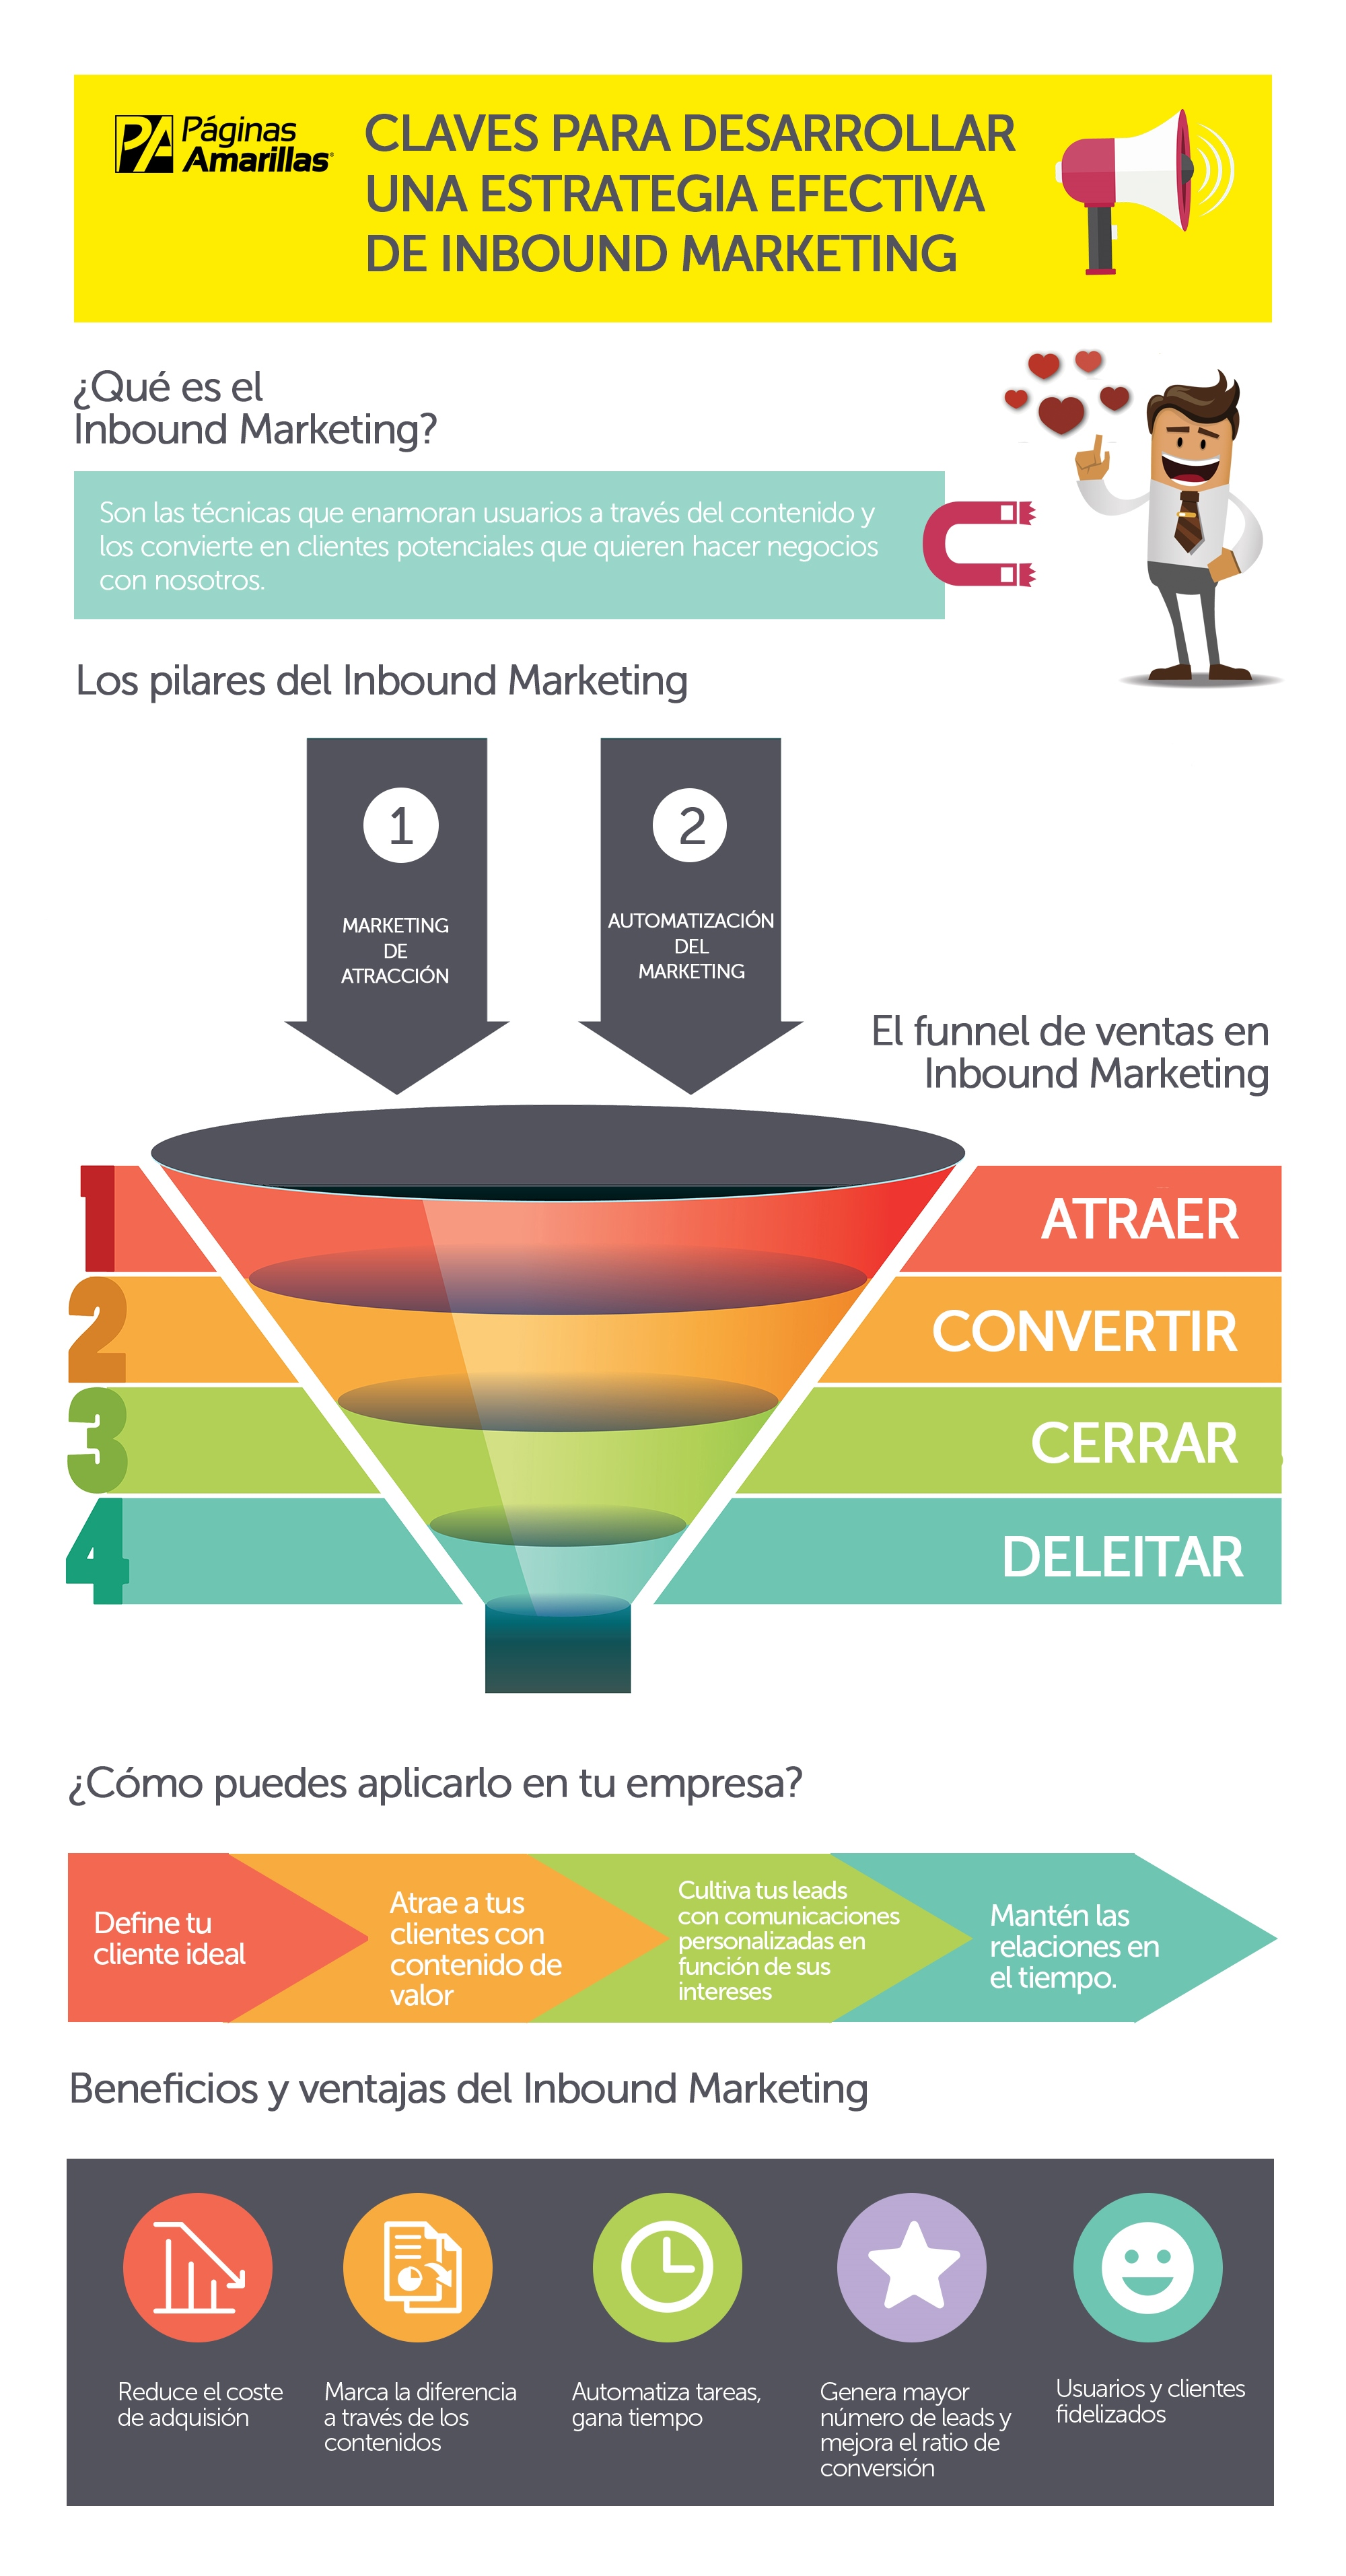 Claves para un estrategia efectiva de Inbound Marketing #infografia #infographic #marketing